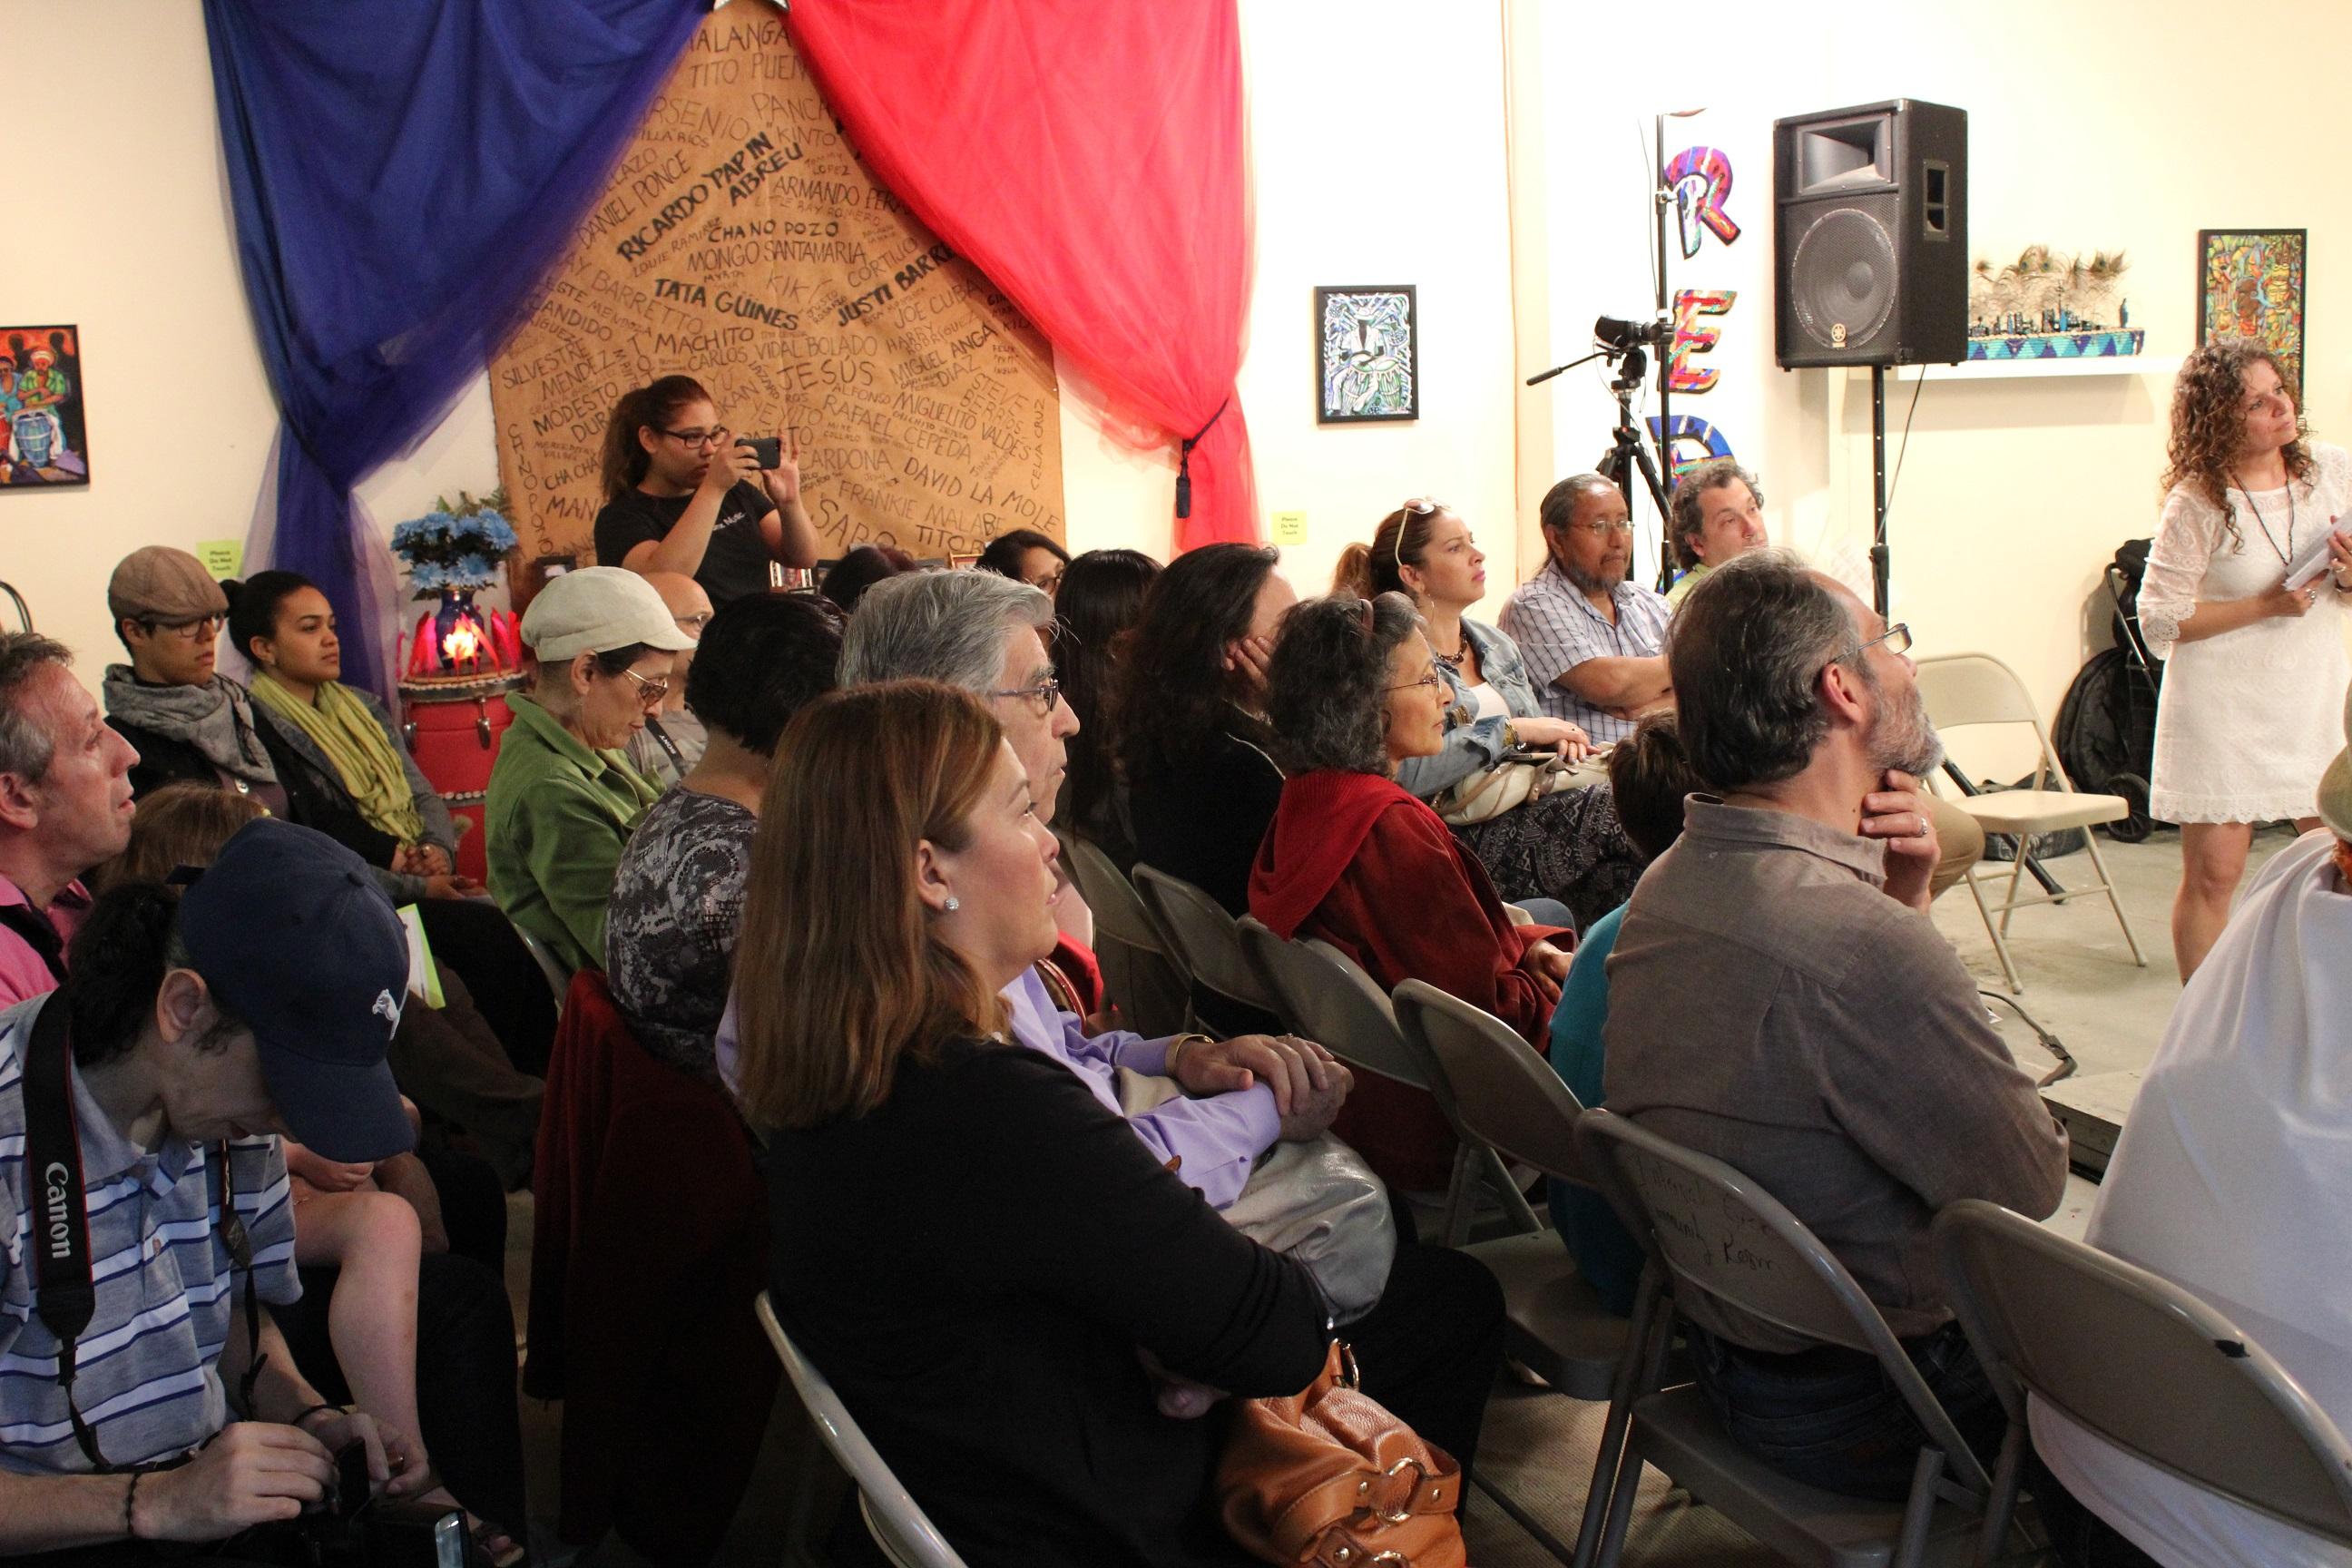 Crowd at Bronx Music Heritage Center lab.